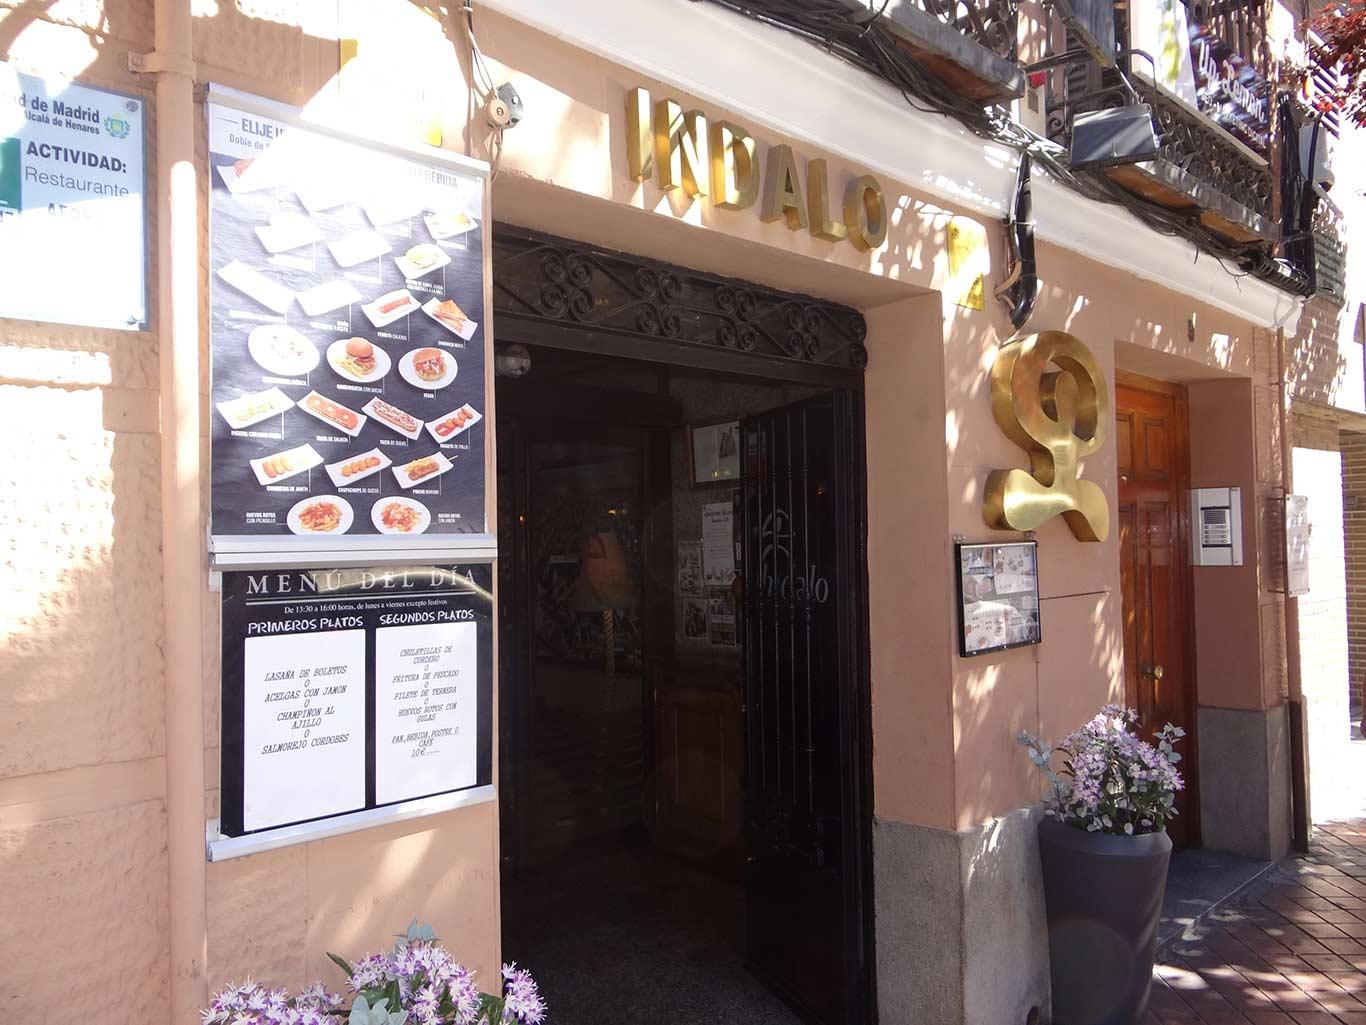 Tapas en Alcalá de Henares - Indalo